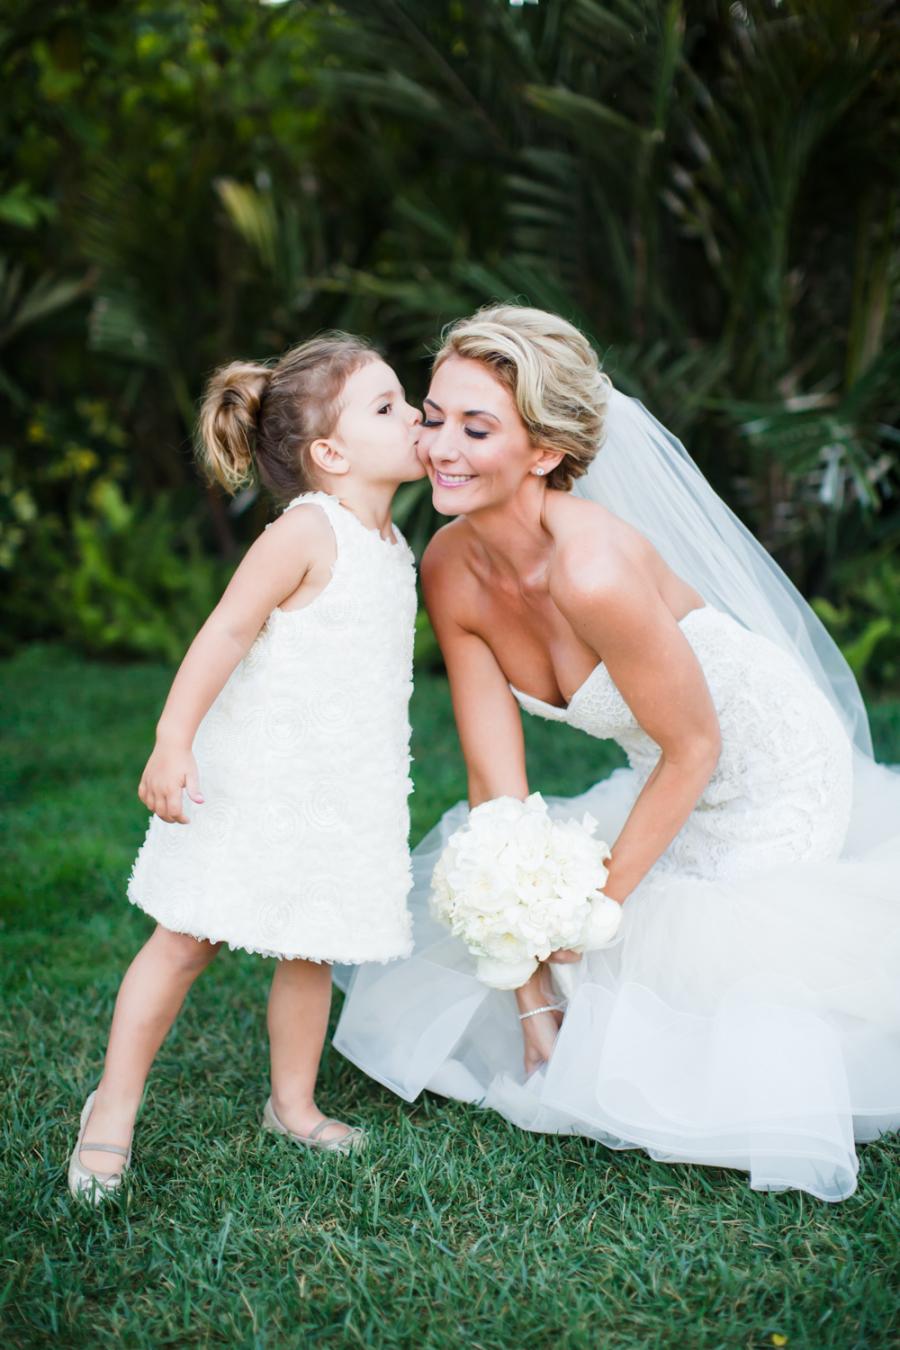 www.santabarbarawedding.com | Ann Johnson Events | Jessica Lewis | The Biltmore | Flower Girl and Bride